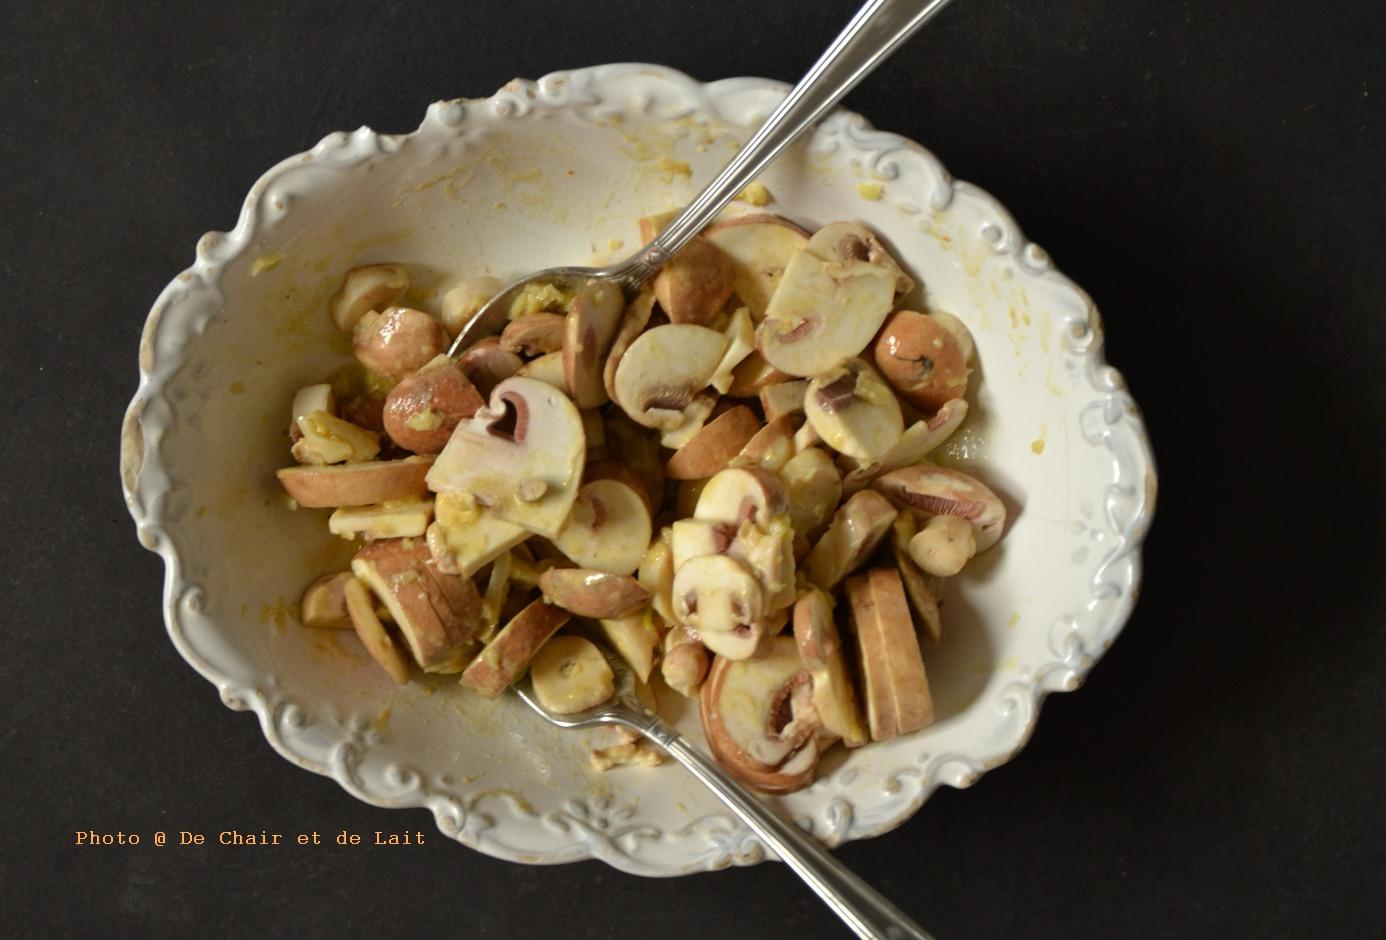 salade de champignons crus sant nutrition. Black Bedroom Furniture Sets. Home Design Ideas